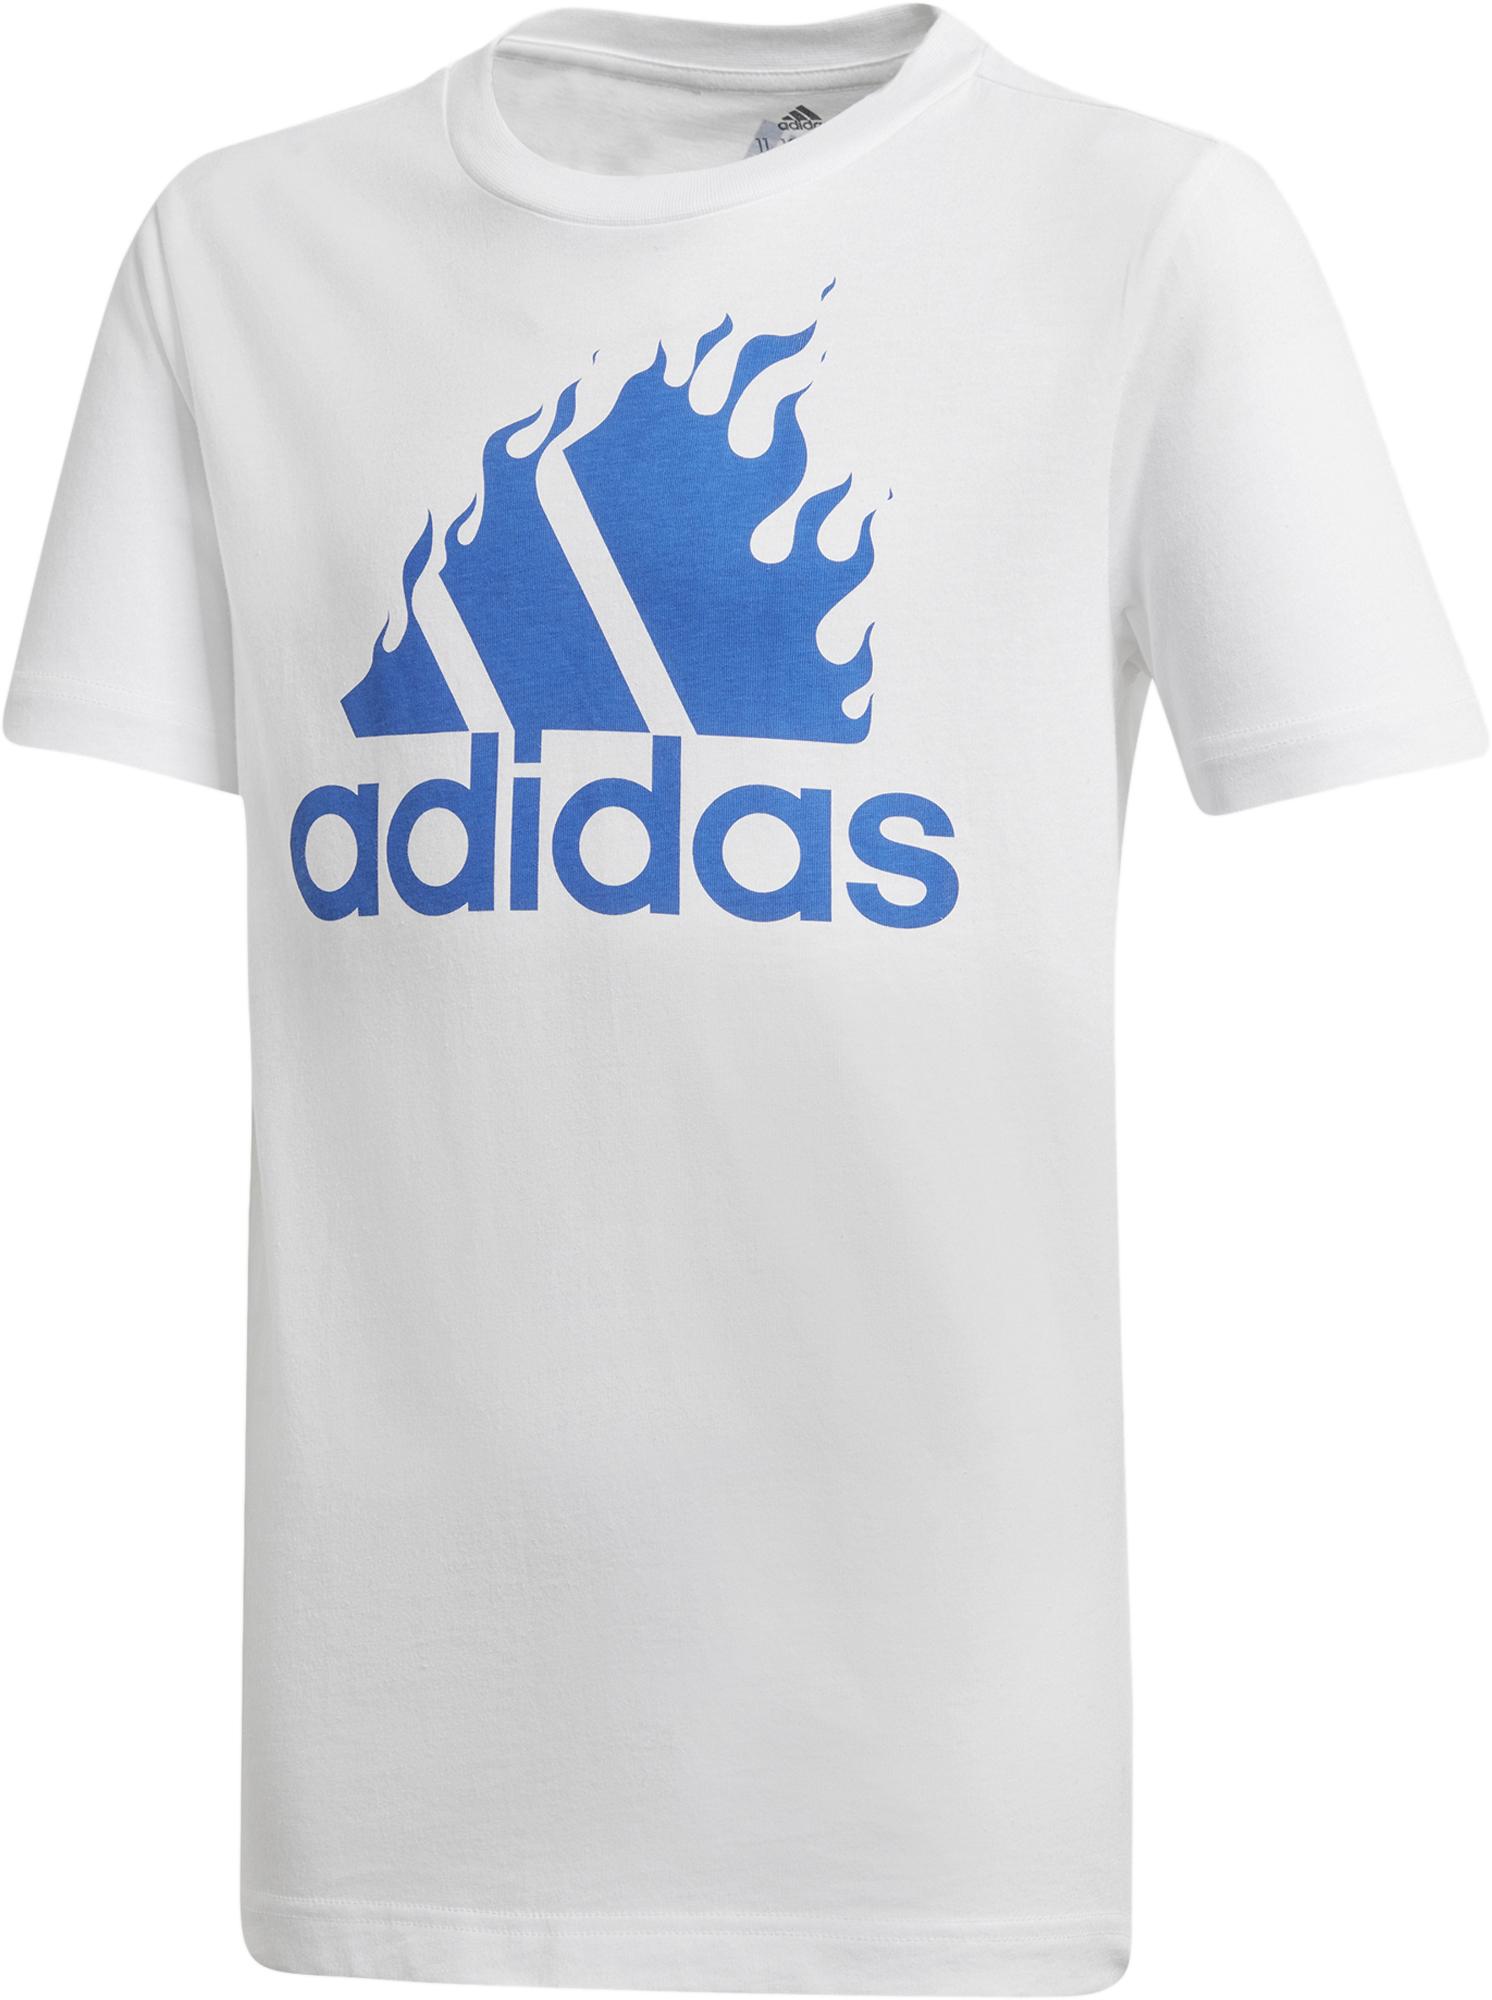 Adidas Футболка для мальчиков adidas Badge of Sport Graph, размер 176